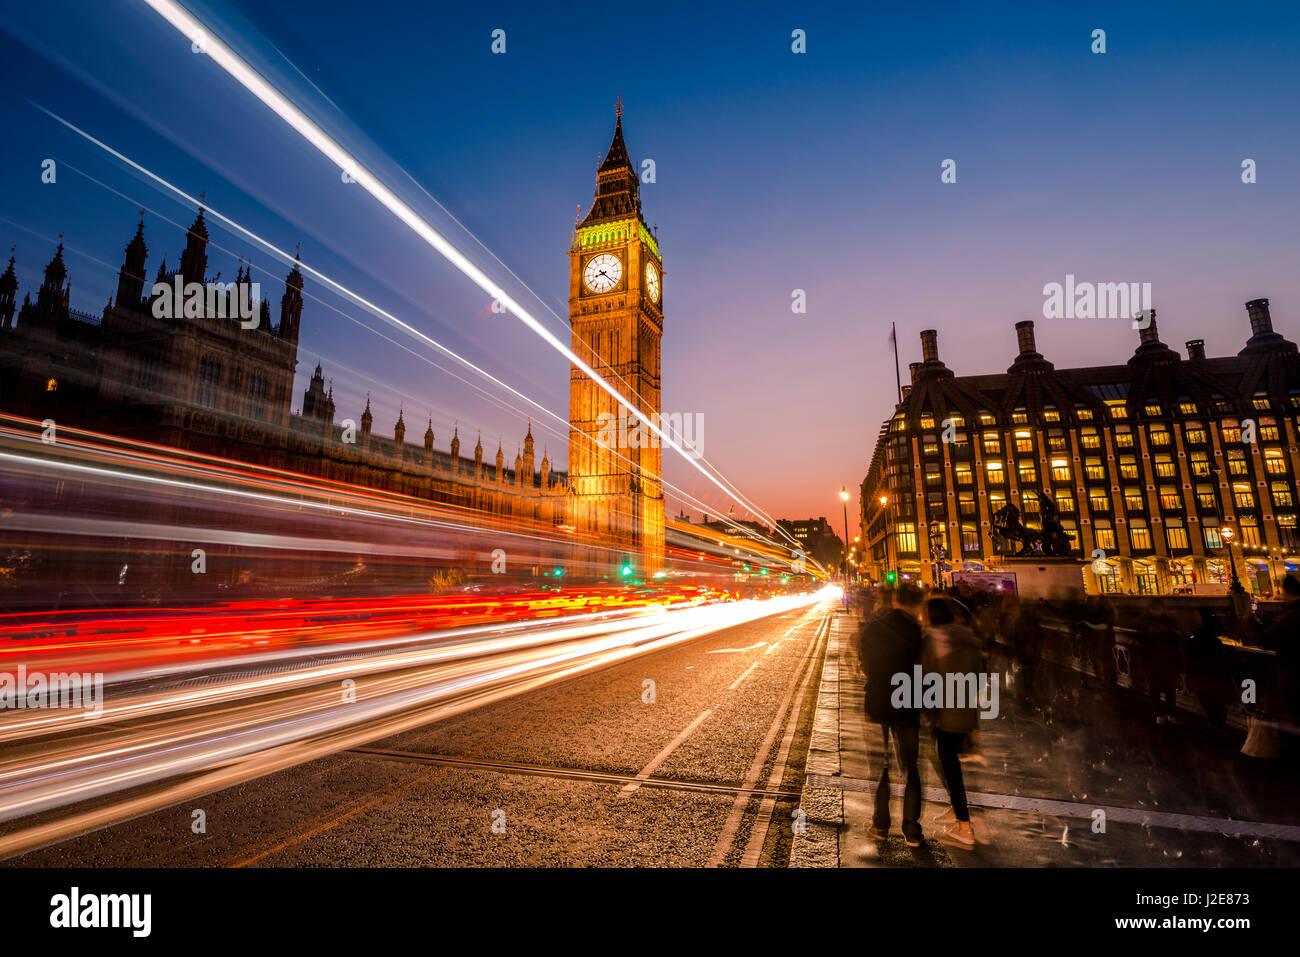 Light trails in front of Big Ben, dusk, evening light, sunset, Houses of Parliament, Westminster Bridge, City of - Stock Image